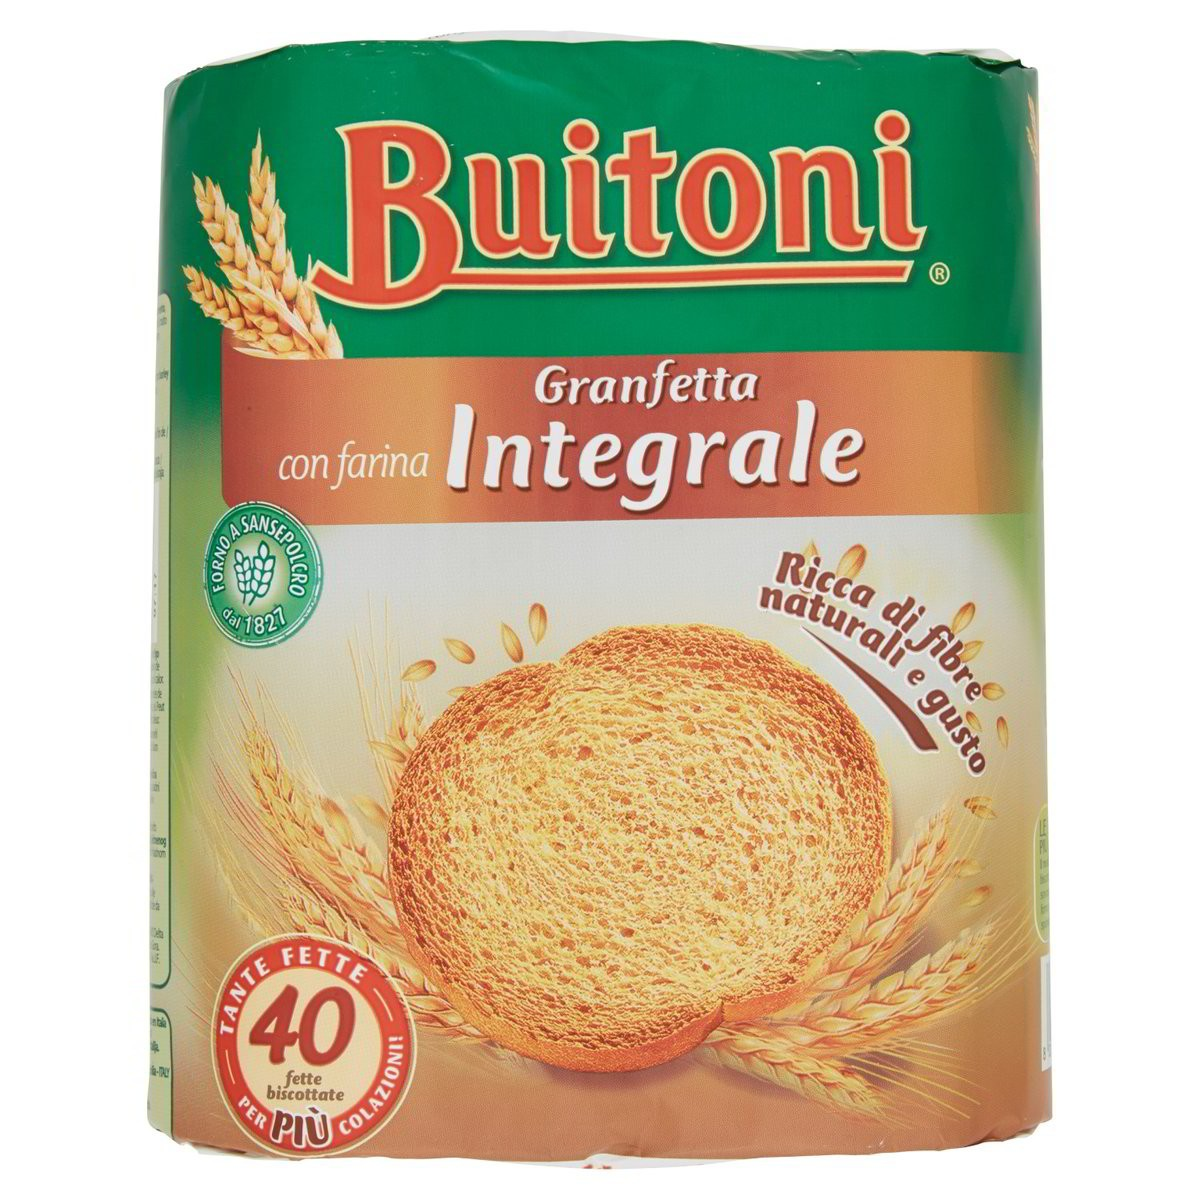 Fette biscottate Granfetta Integrali